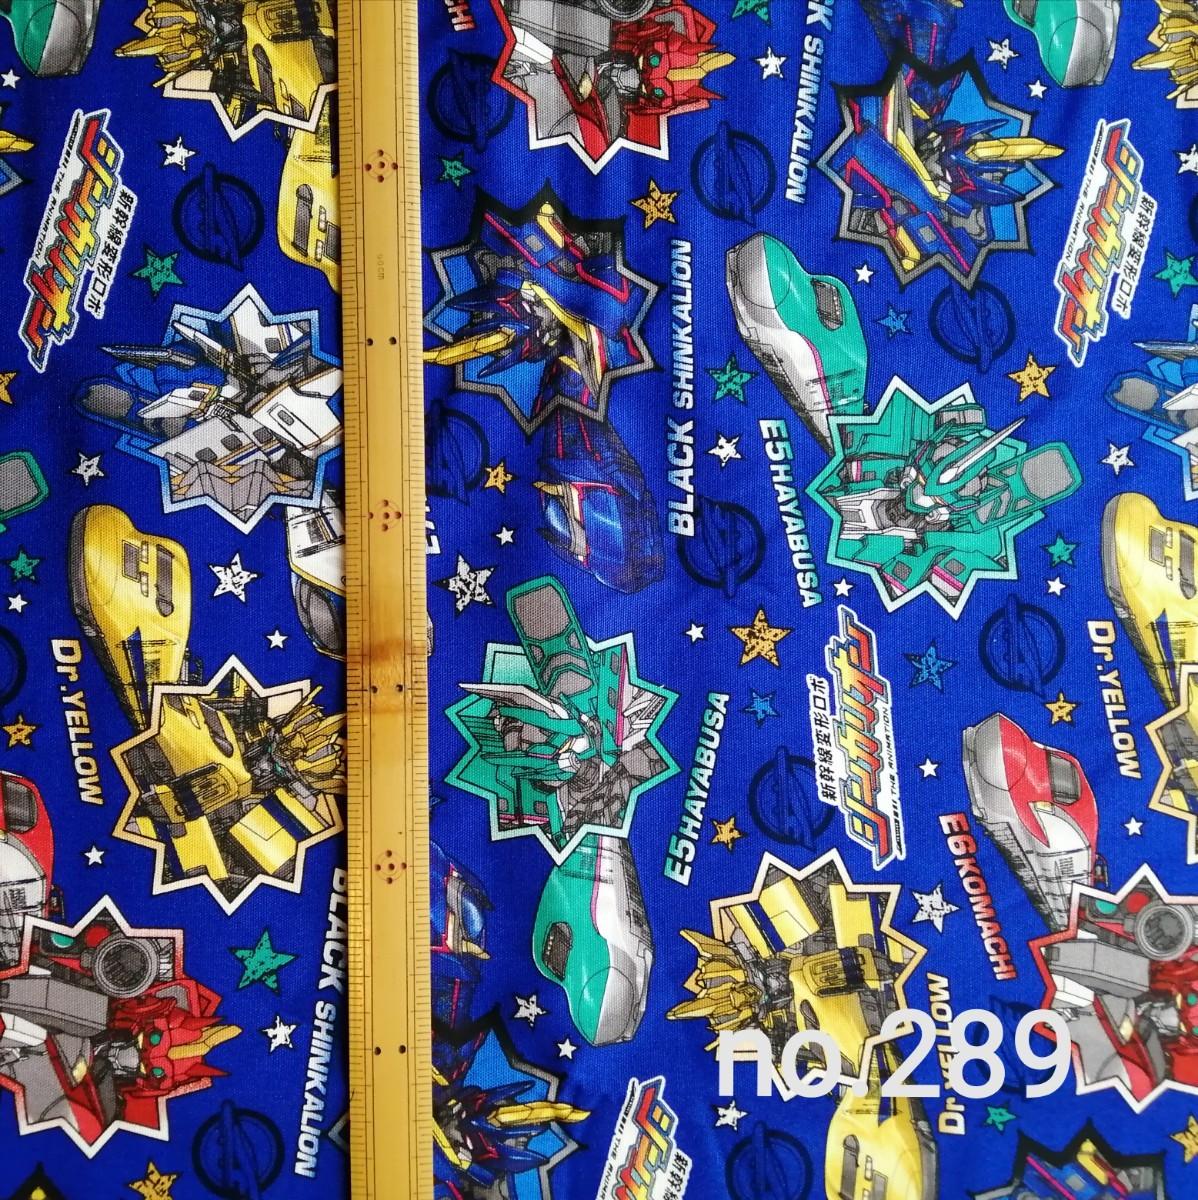 No.289  シンカリオン 生地幅約110×50cm 日本製 綿100% オックス生地 プリント 布 はぎれ 青 紺 ブルー